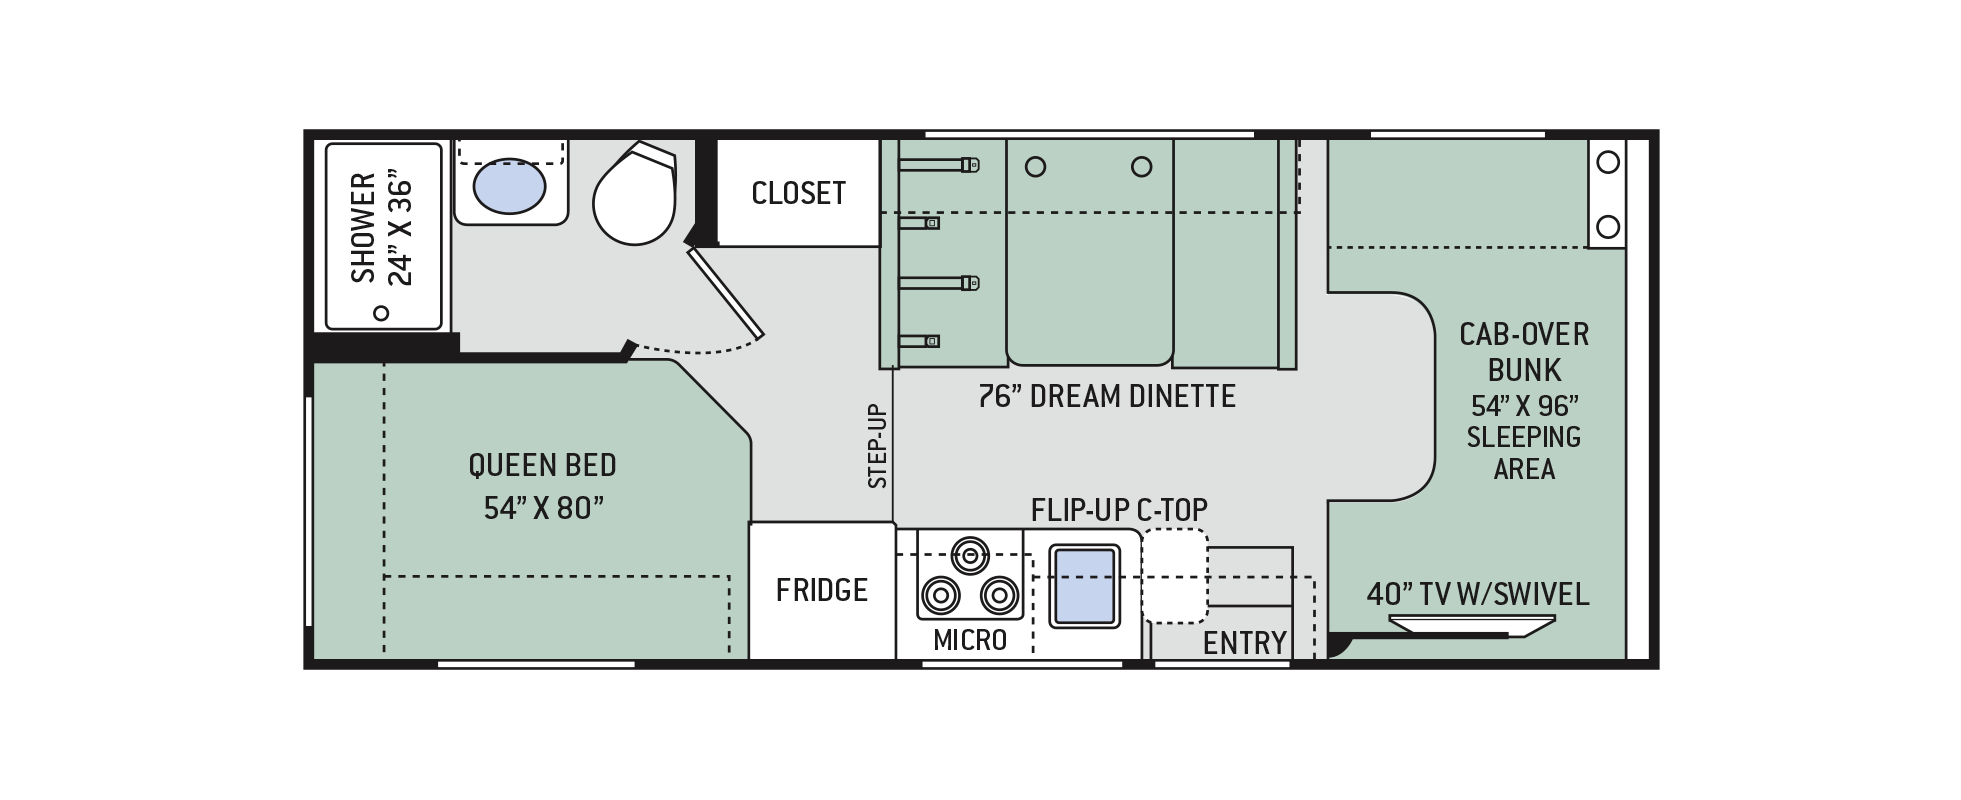 Freedom Elite Class C Motorhomes Floor Plan 22he Thor